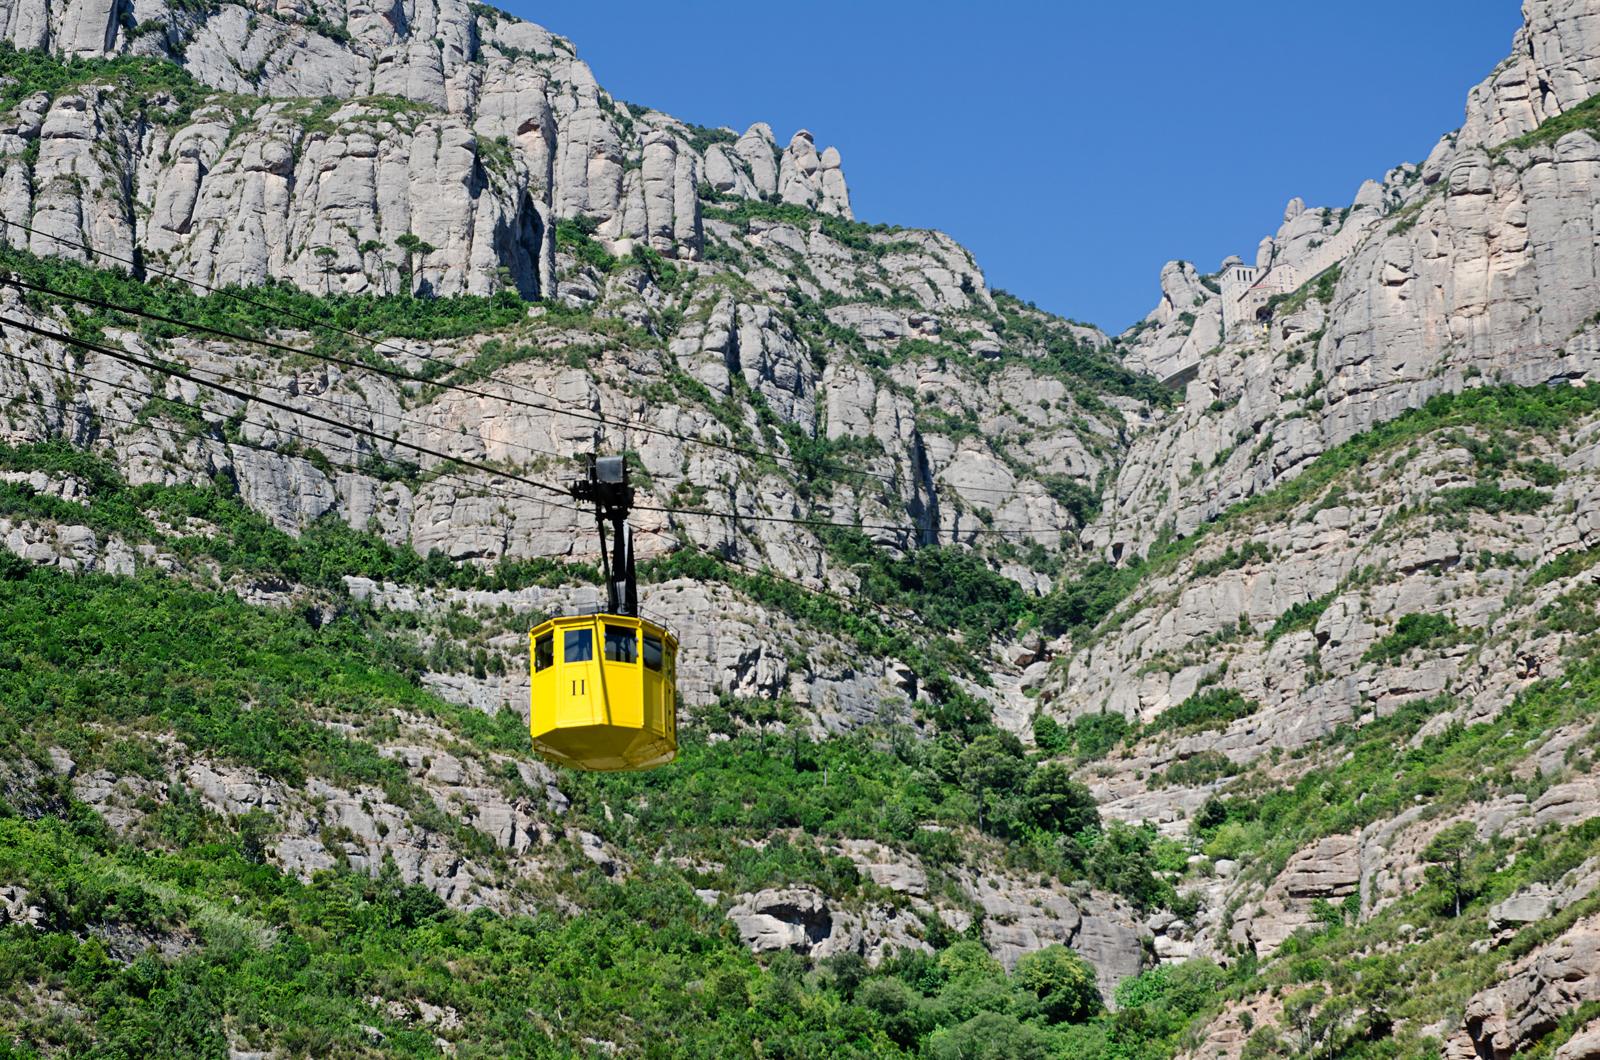 Montserrat Aerial Cable Car